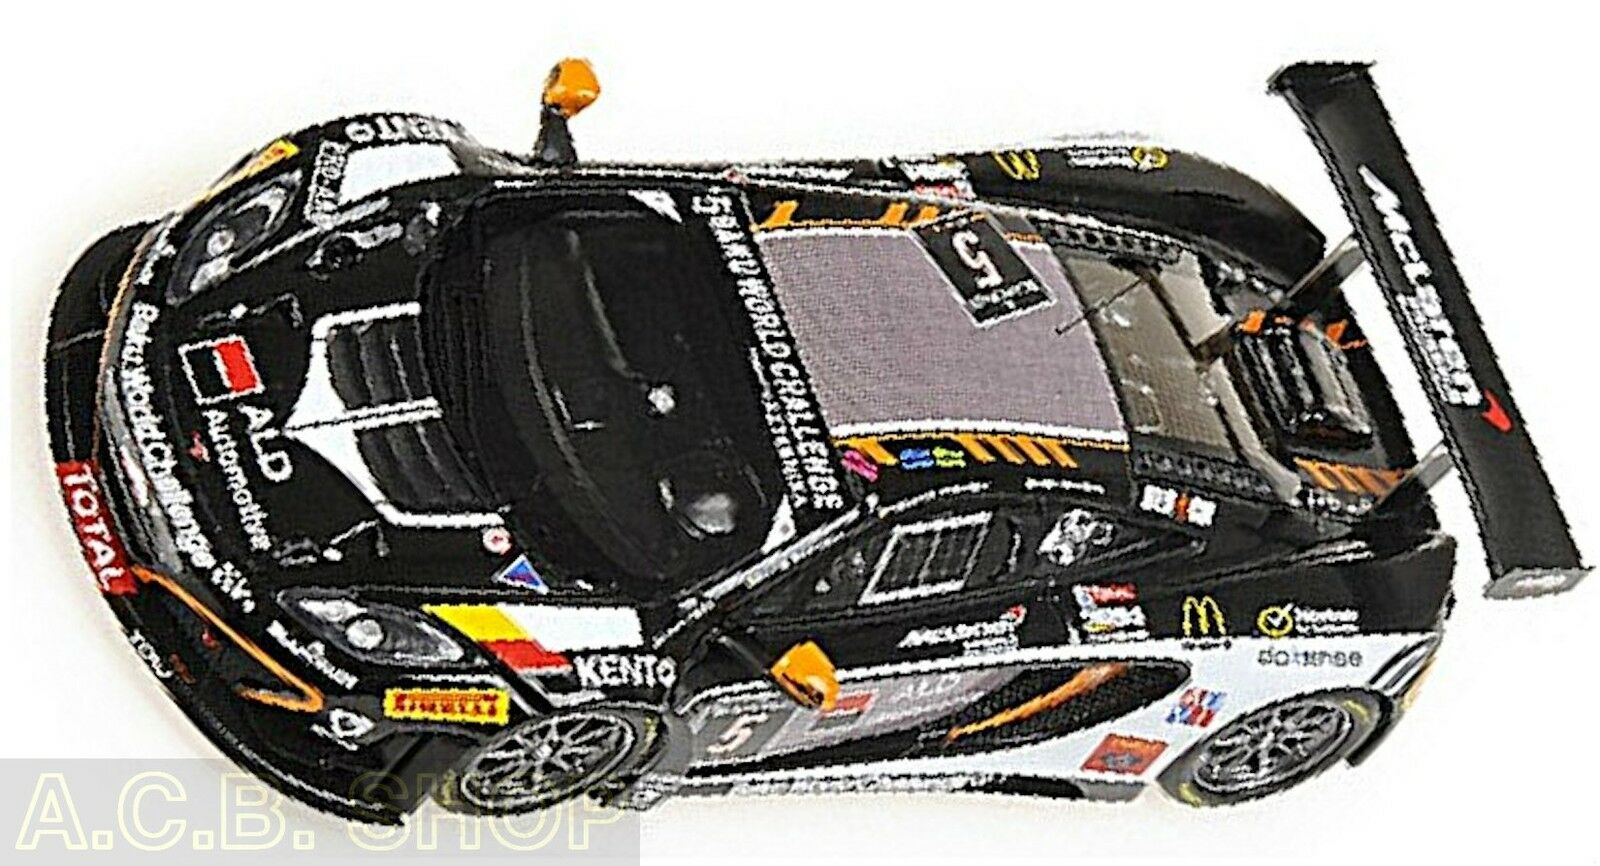 McLaren 12c gt3 24h spa spa spa 2013-boutson Ginion racing  5 1 43 MINICHAMPS 117a3a